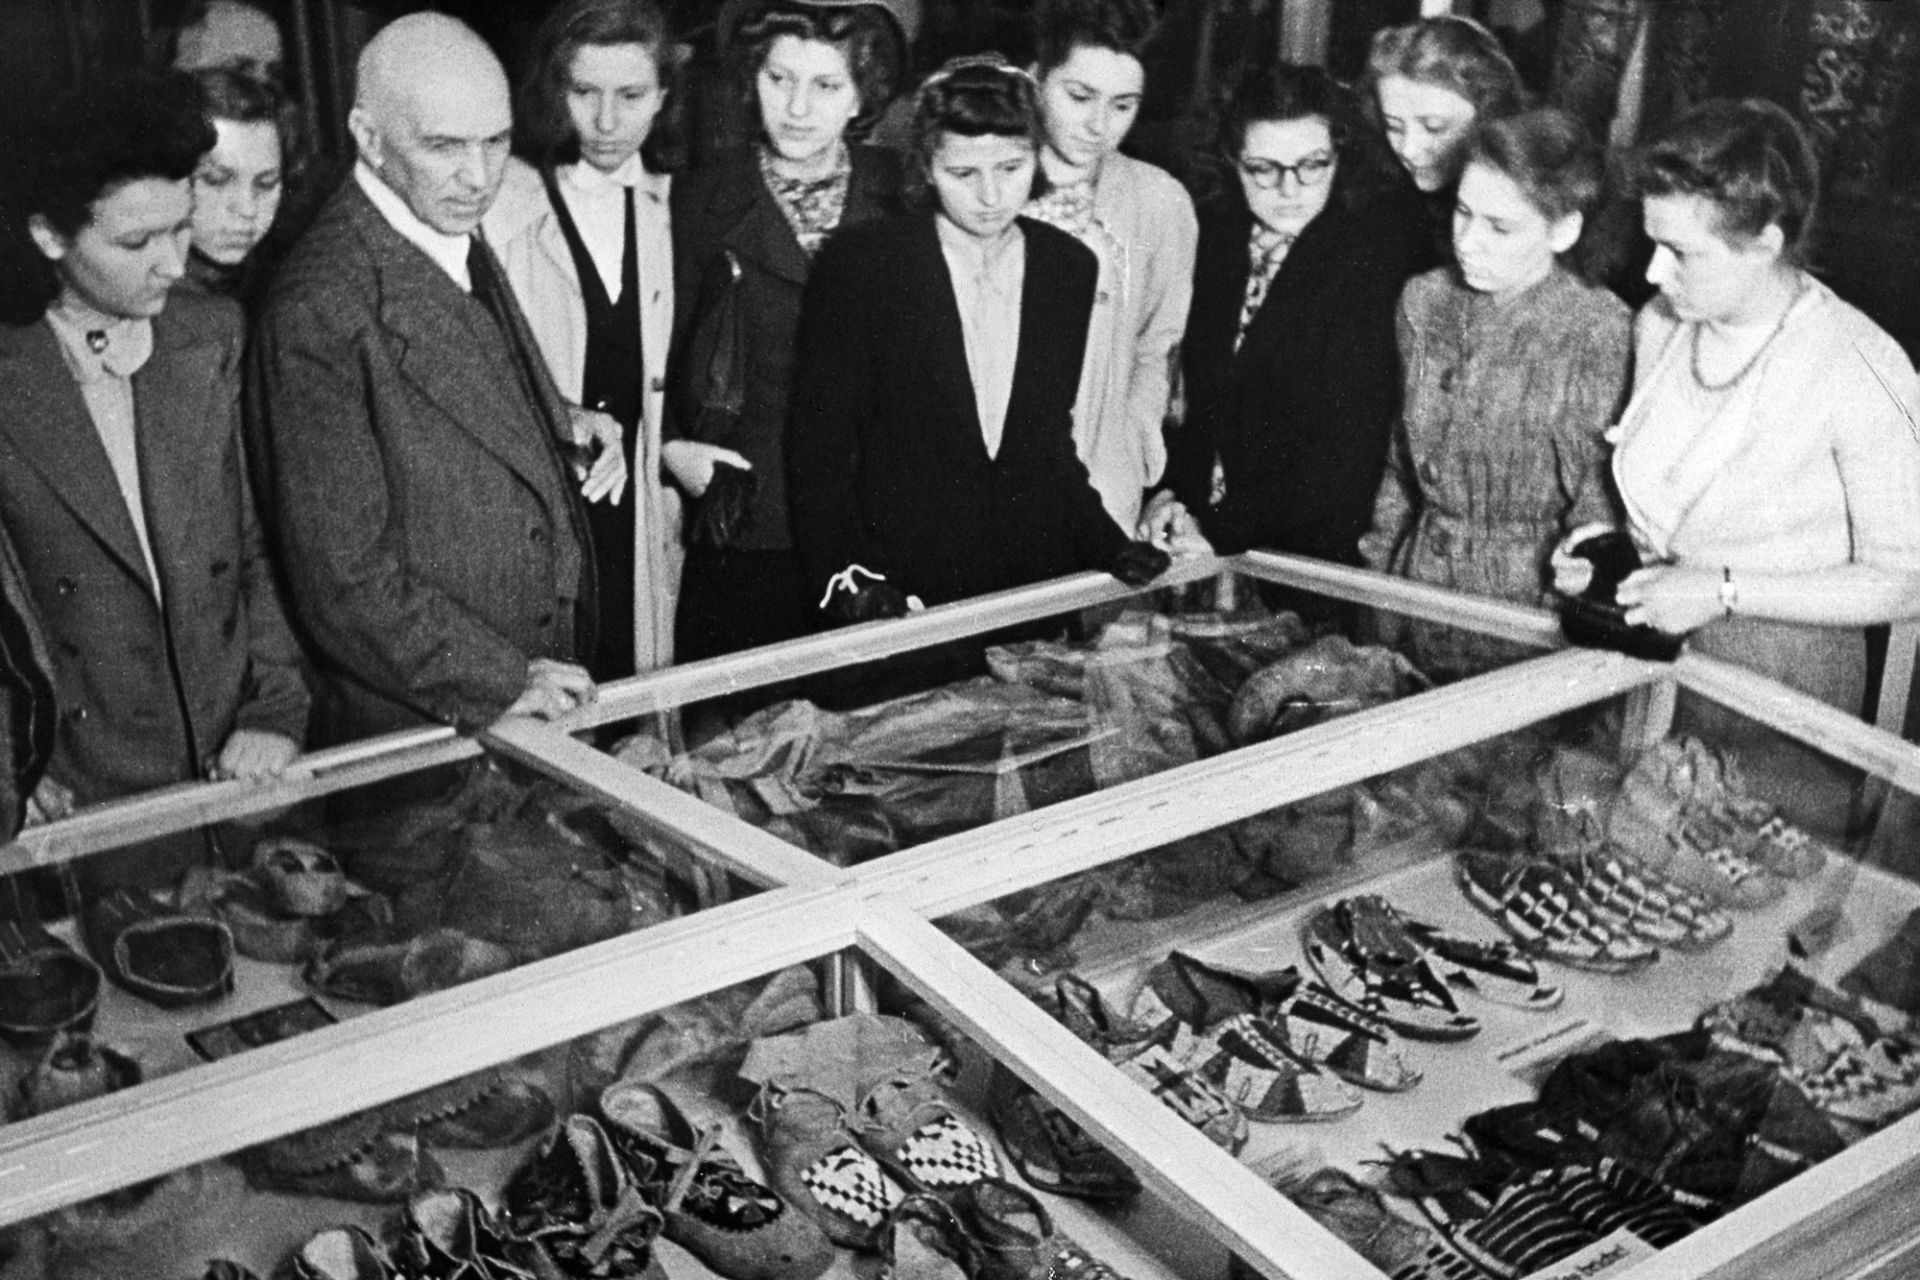 Museum tour with Hugo Eberhardt, around 1942